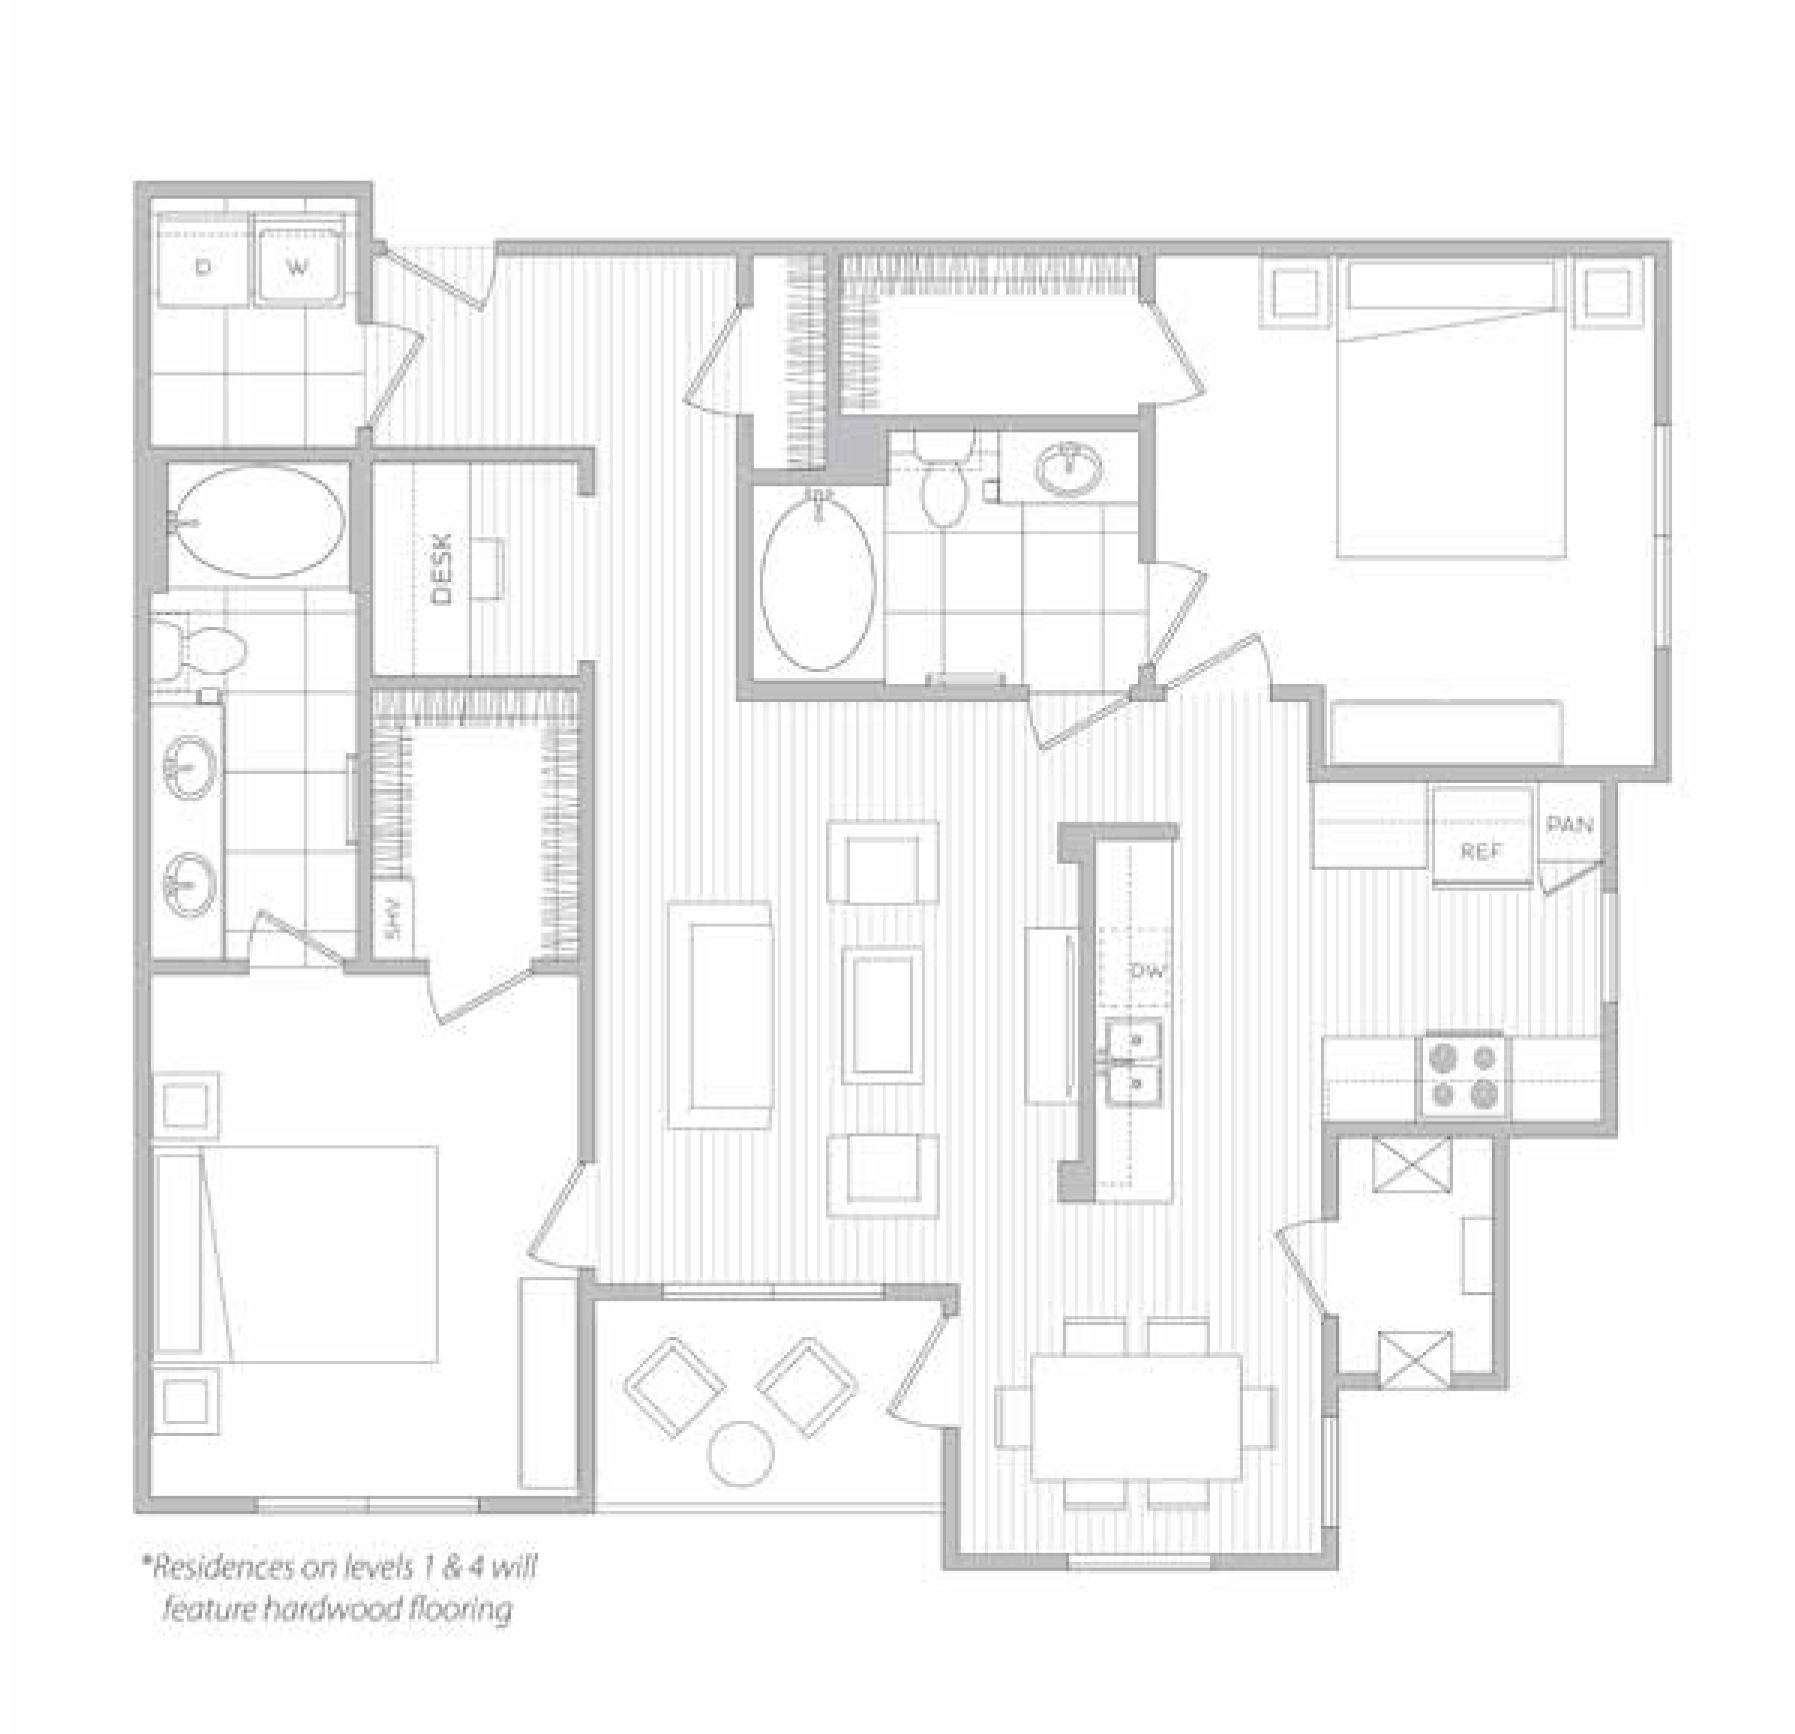 floor plan image of apartment 3312